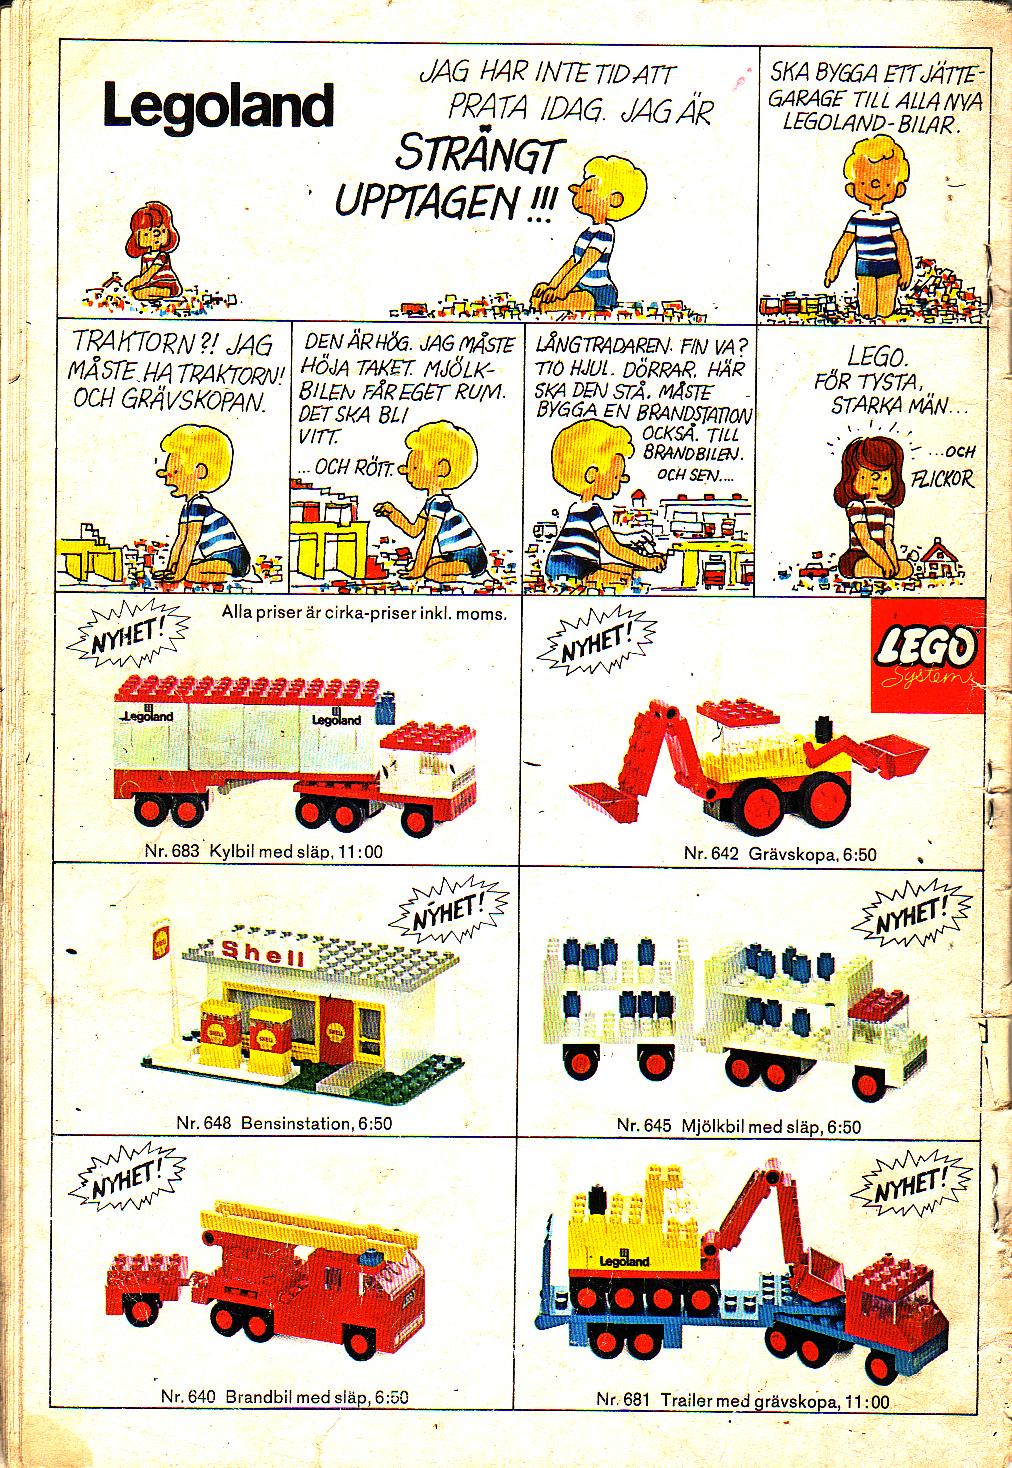 legoland1971.jpg